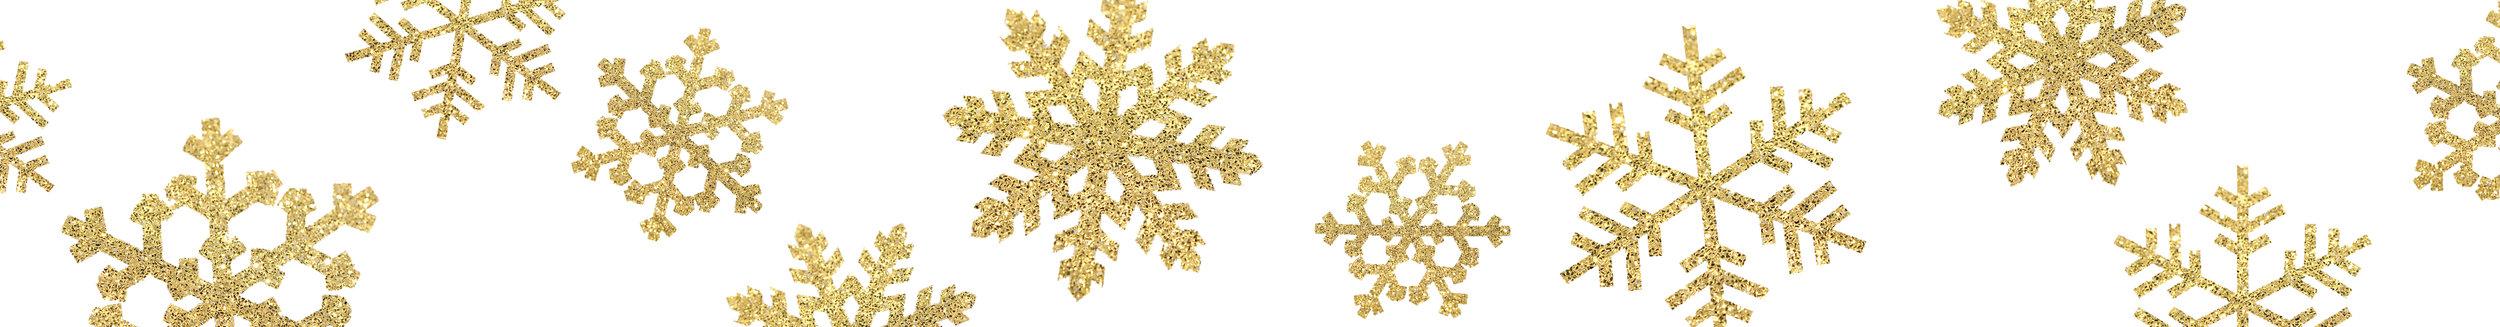 kerry-gilligan-snowflake-border.jpg